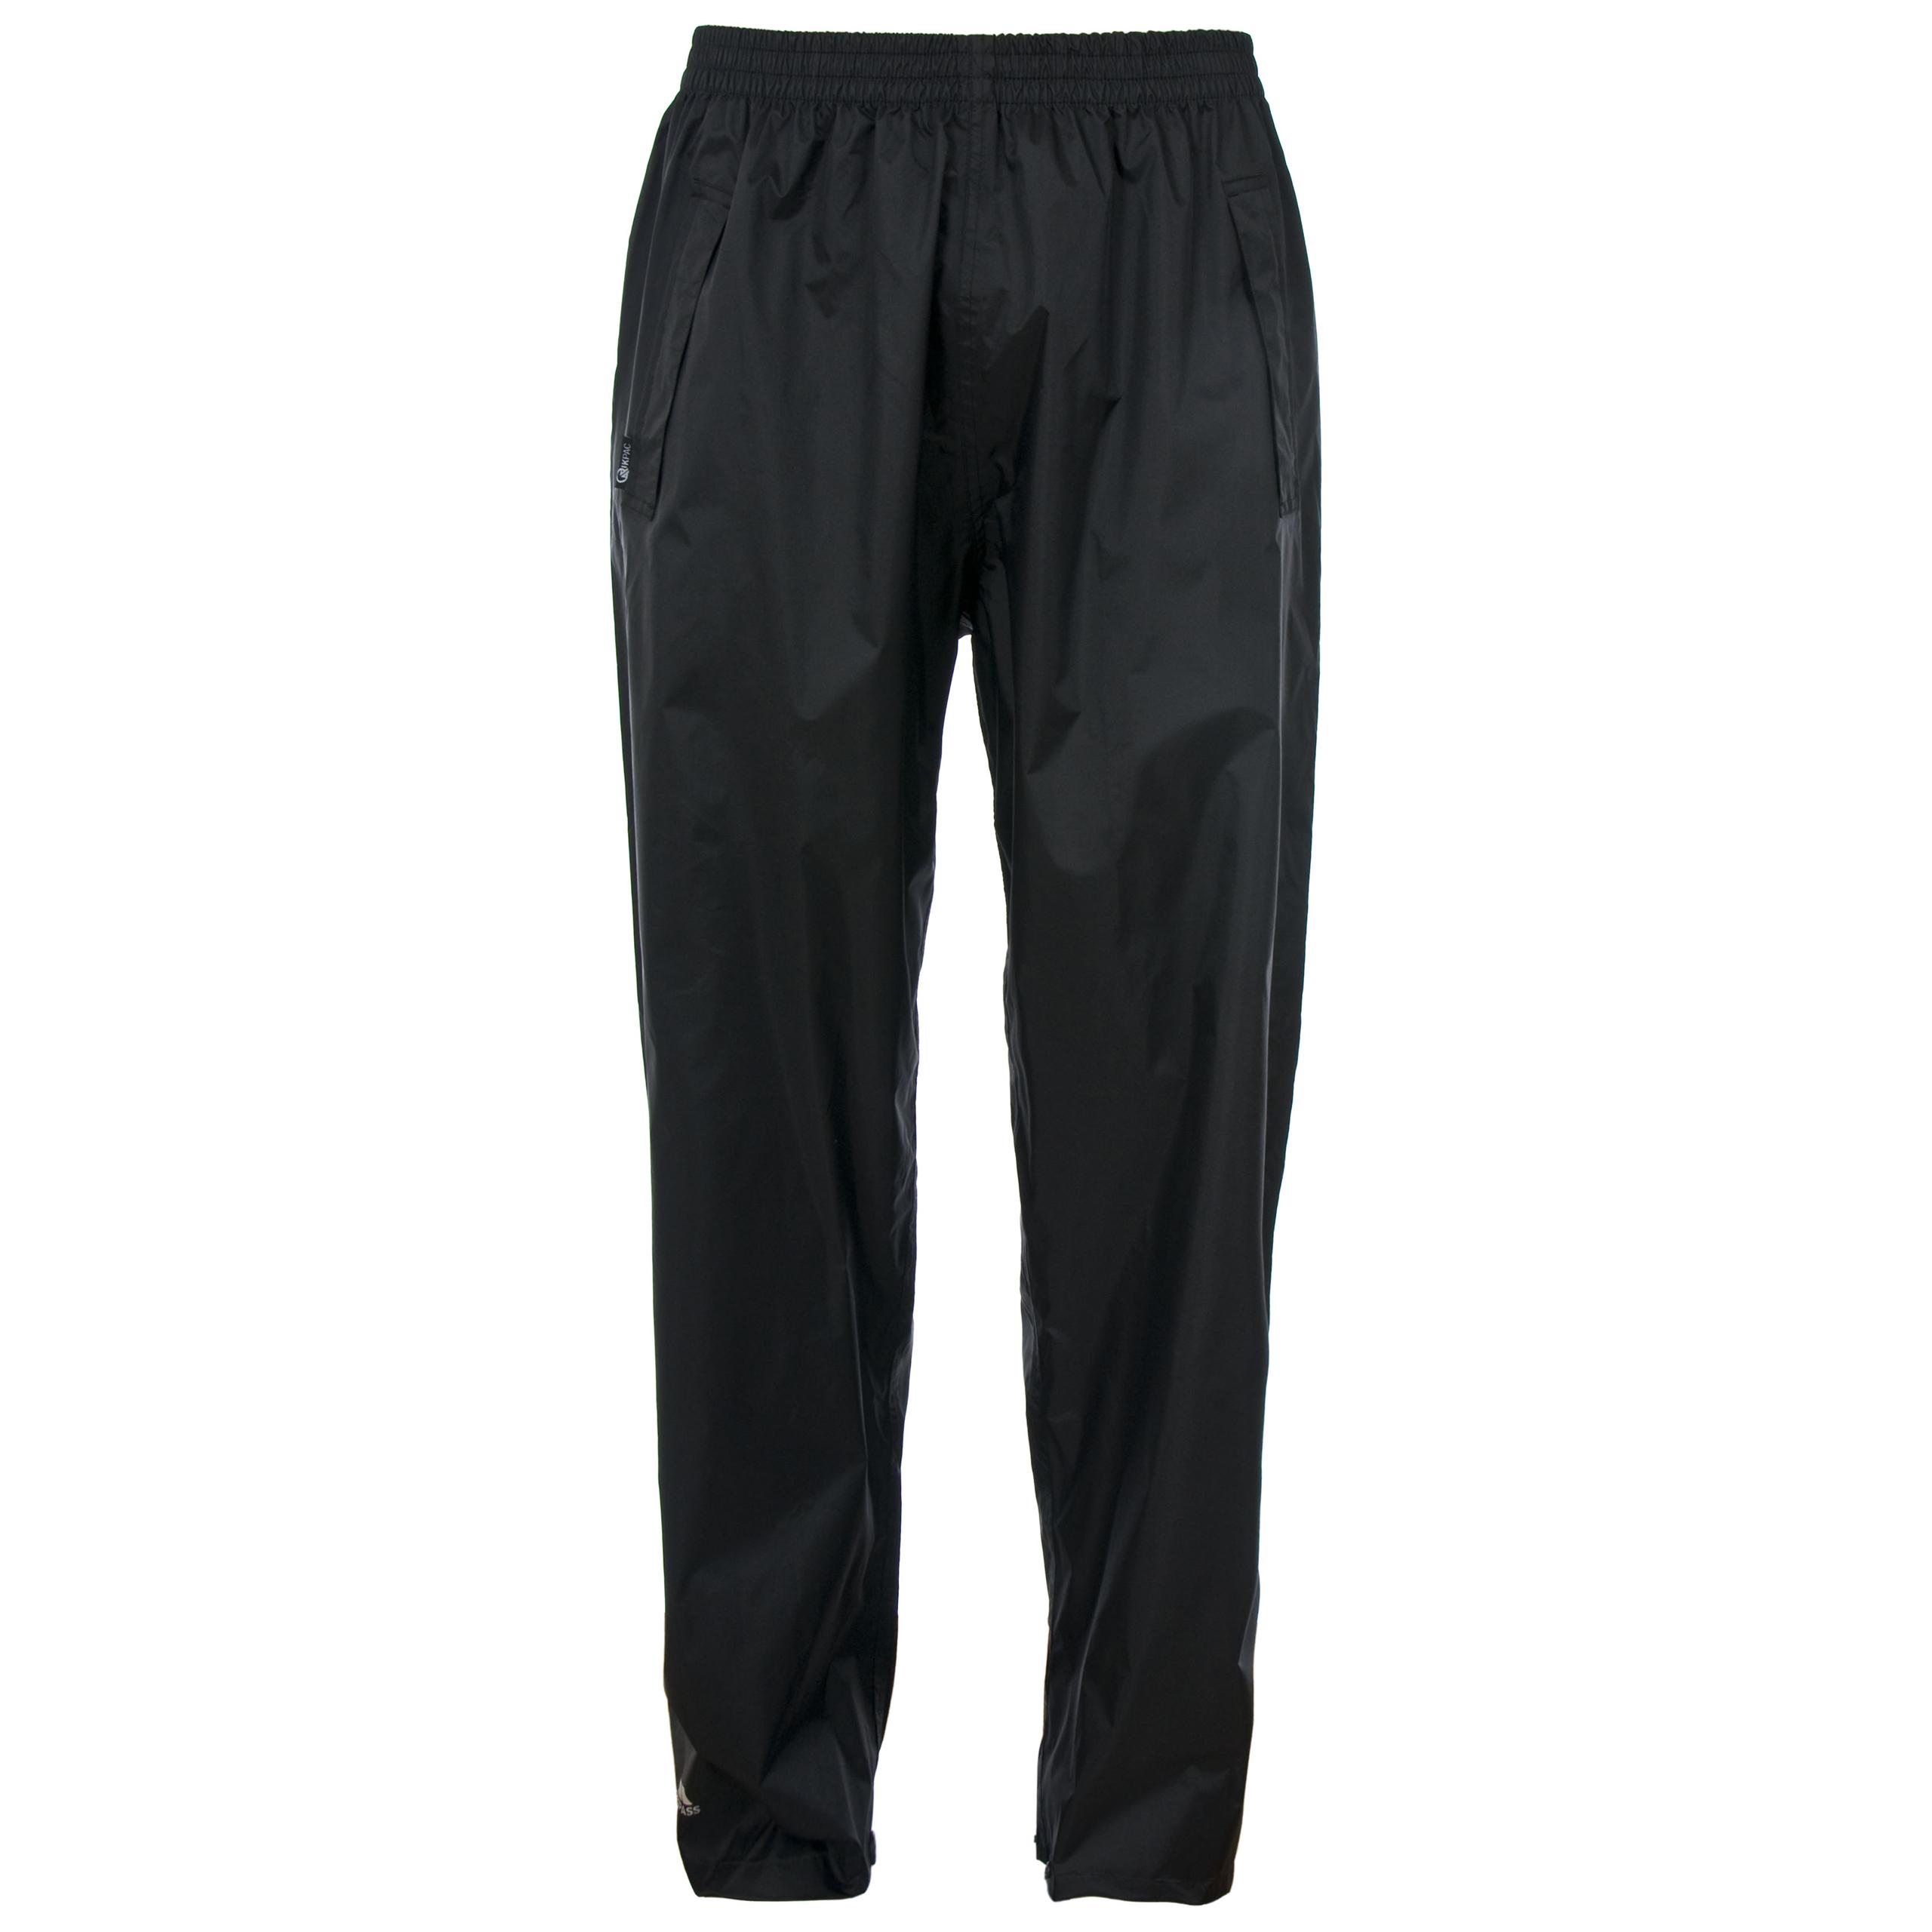 Trespass Qikpac Men Women Waterproof Trousers in Black and Navy